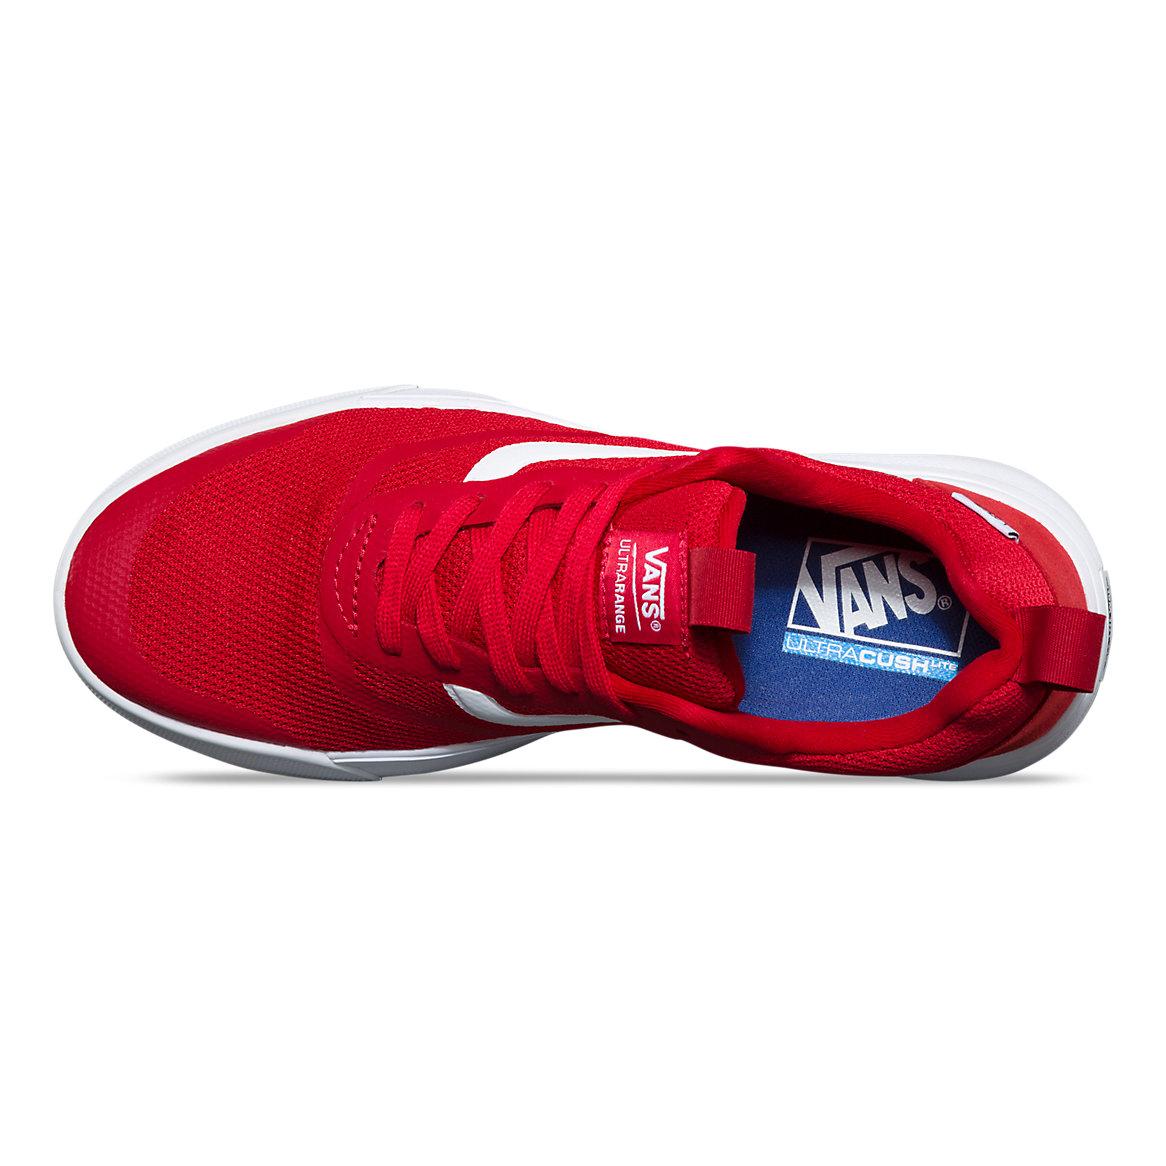 607ceb6386 Vans Ultrarange Rapidweld Women s Shoe - Chilli Pepper Red ...